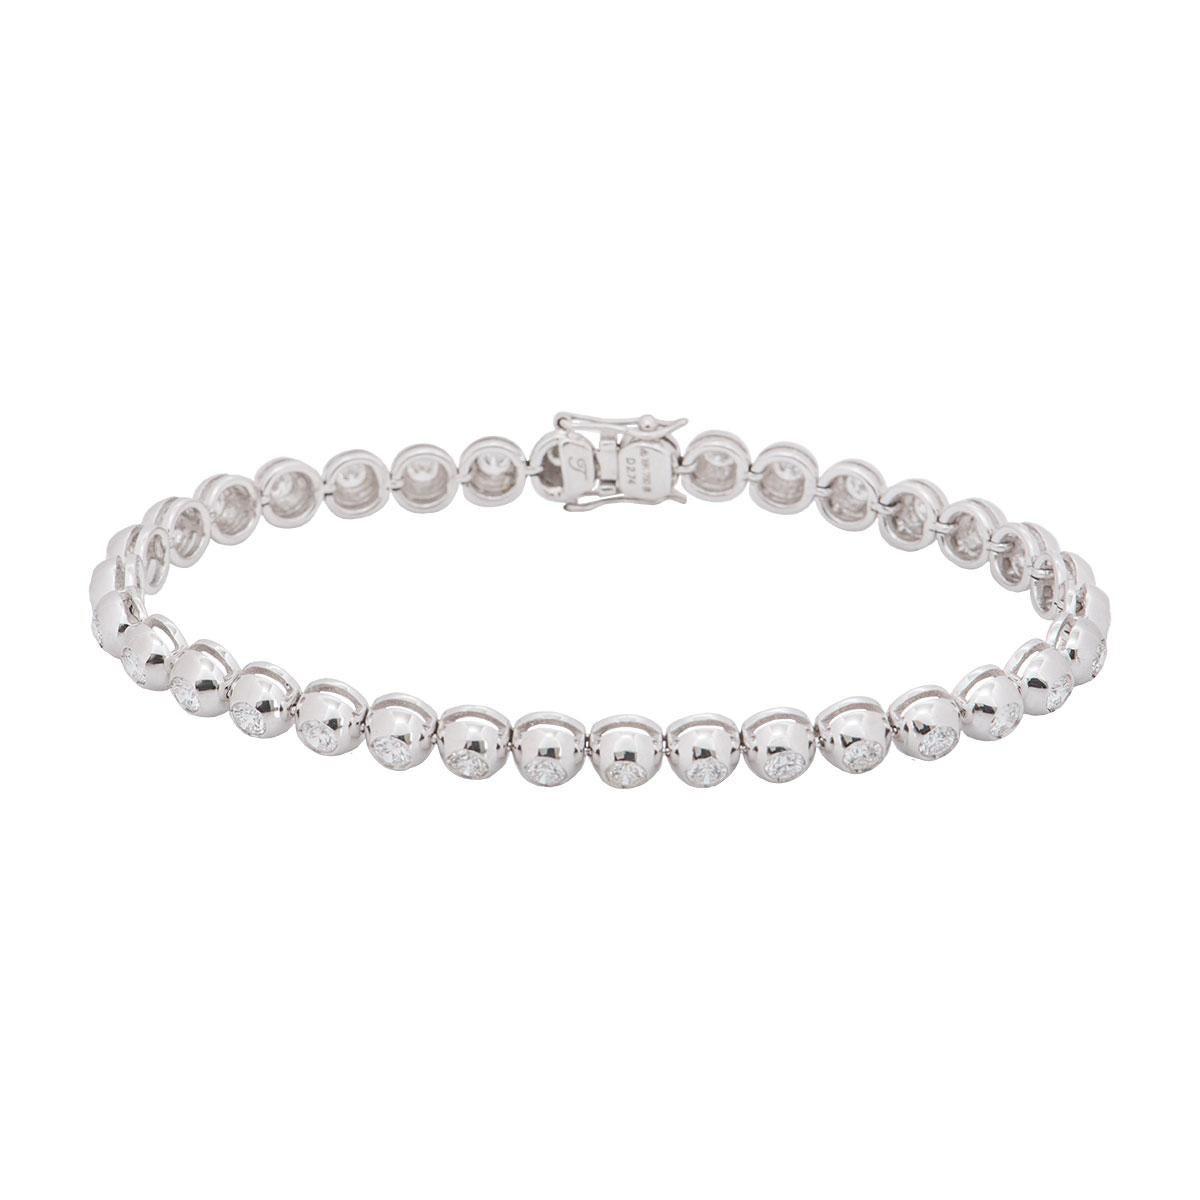 Diamond Line Tennis Bracelet 2.74 Carat